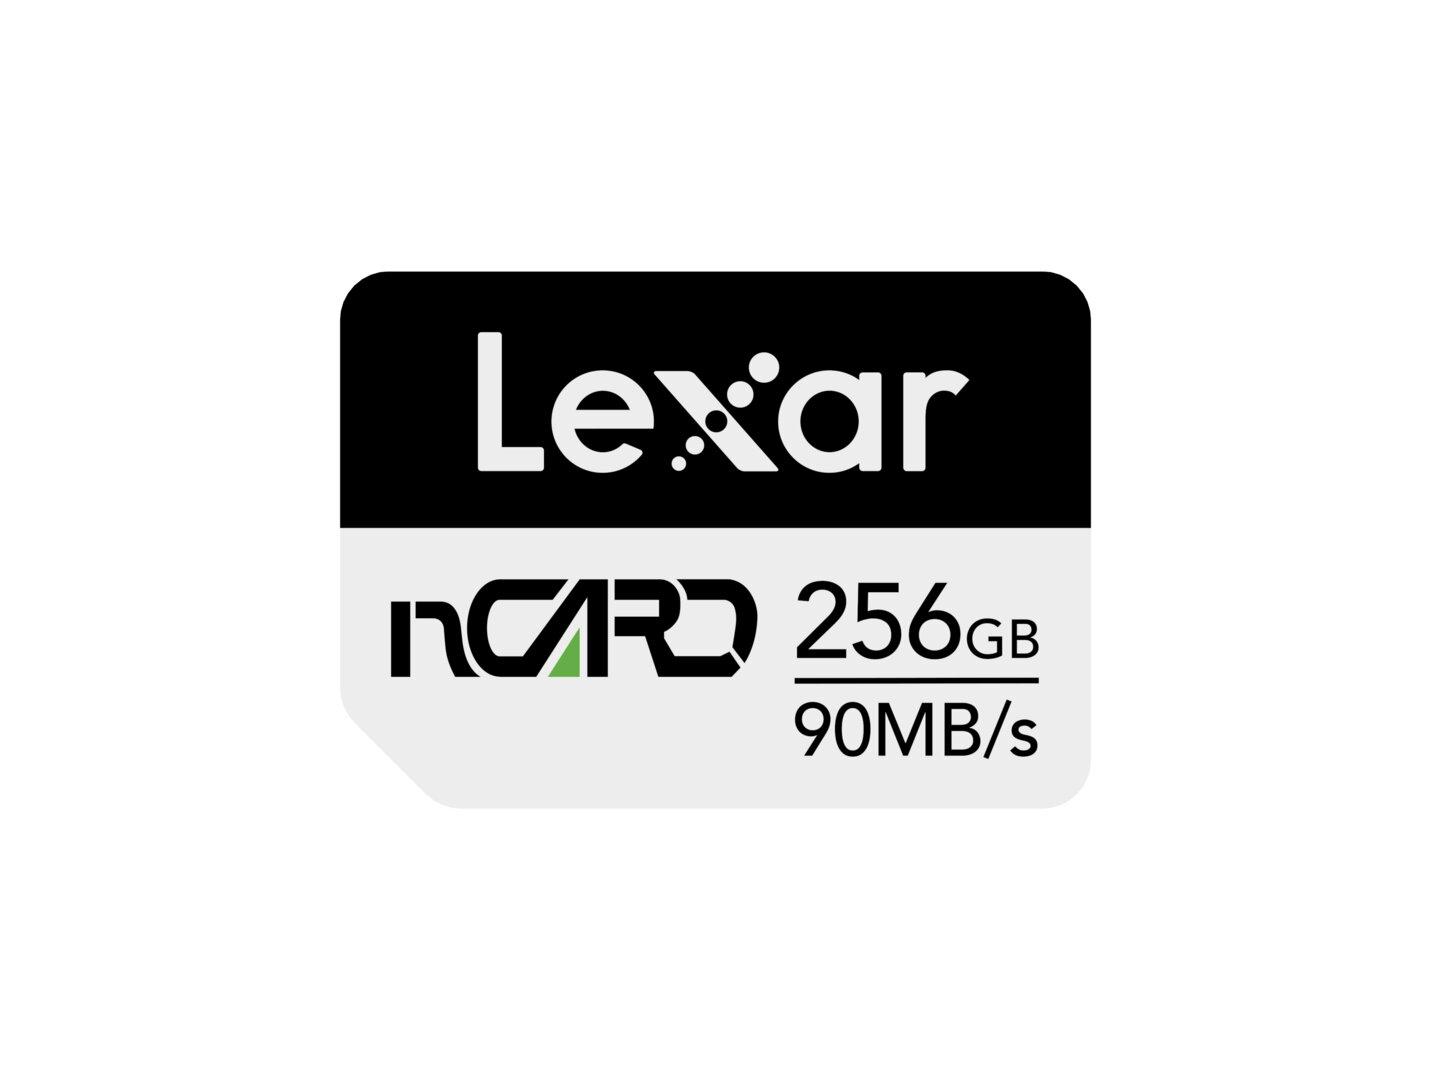 Lexar NM Card mit 256GB